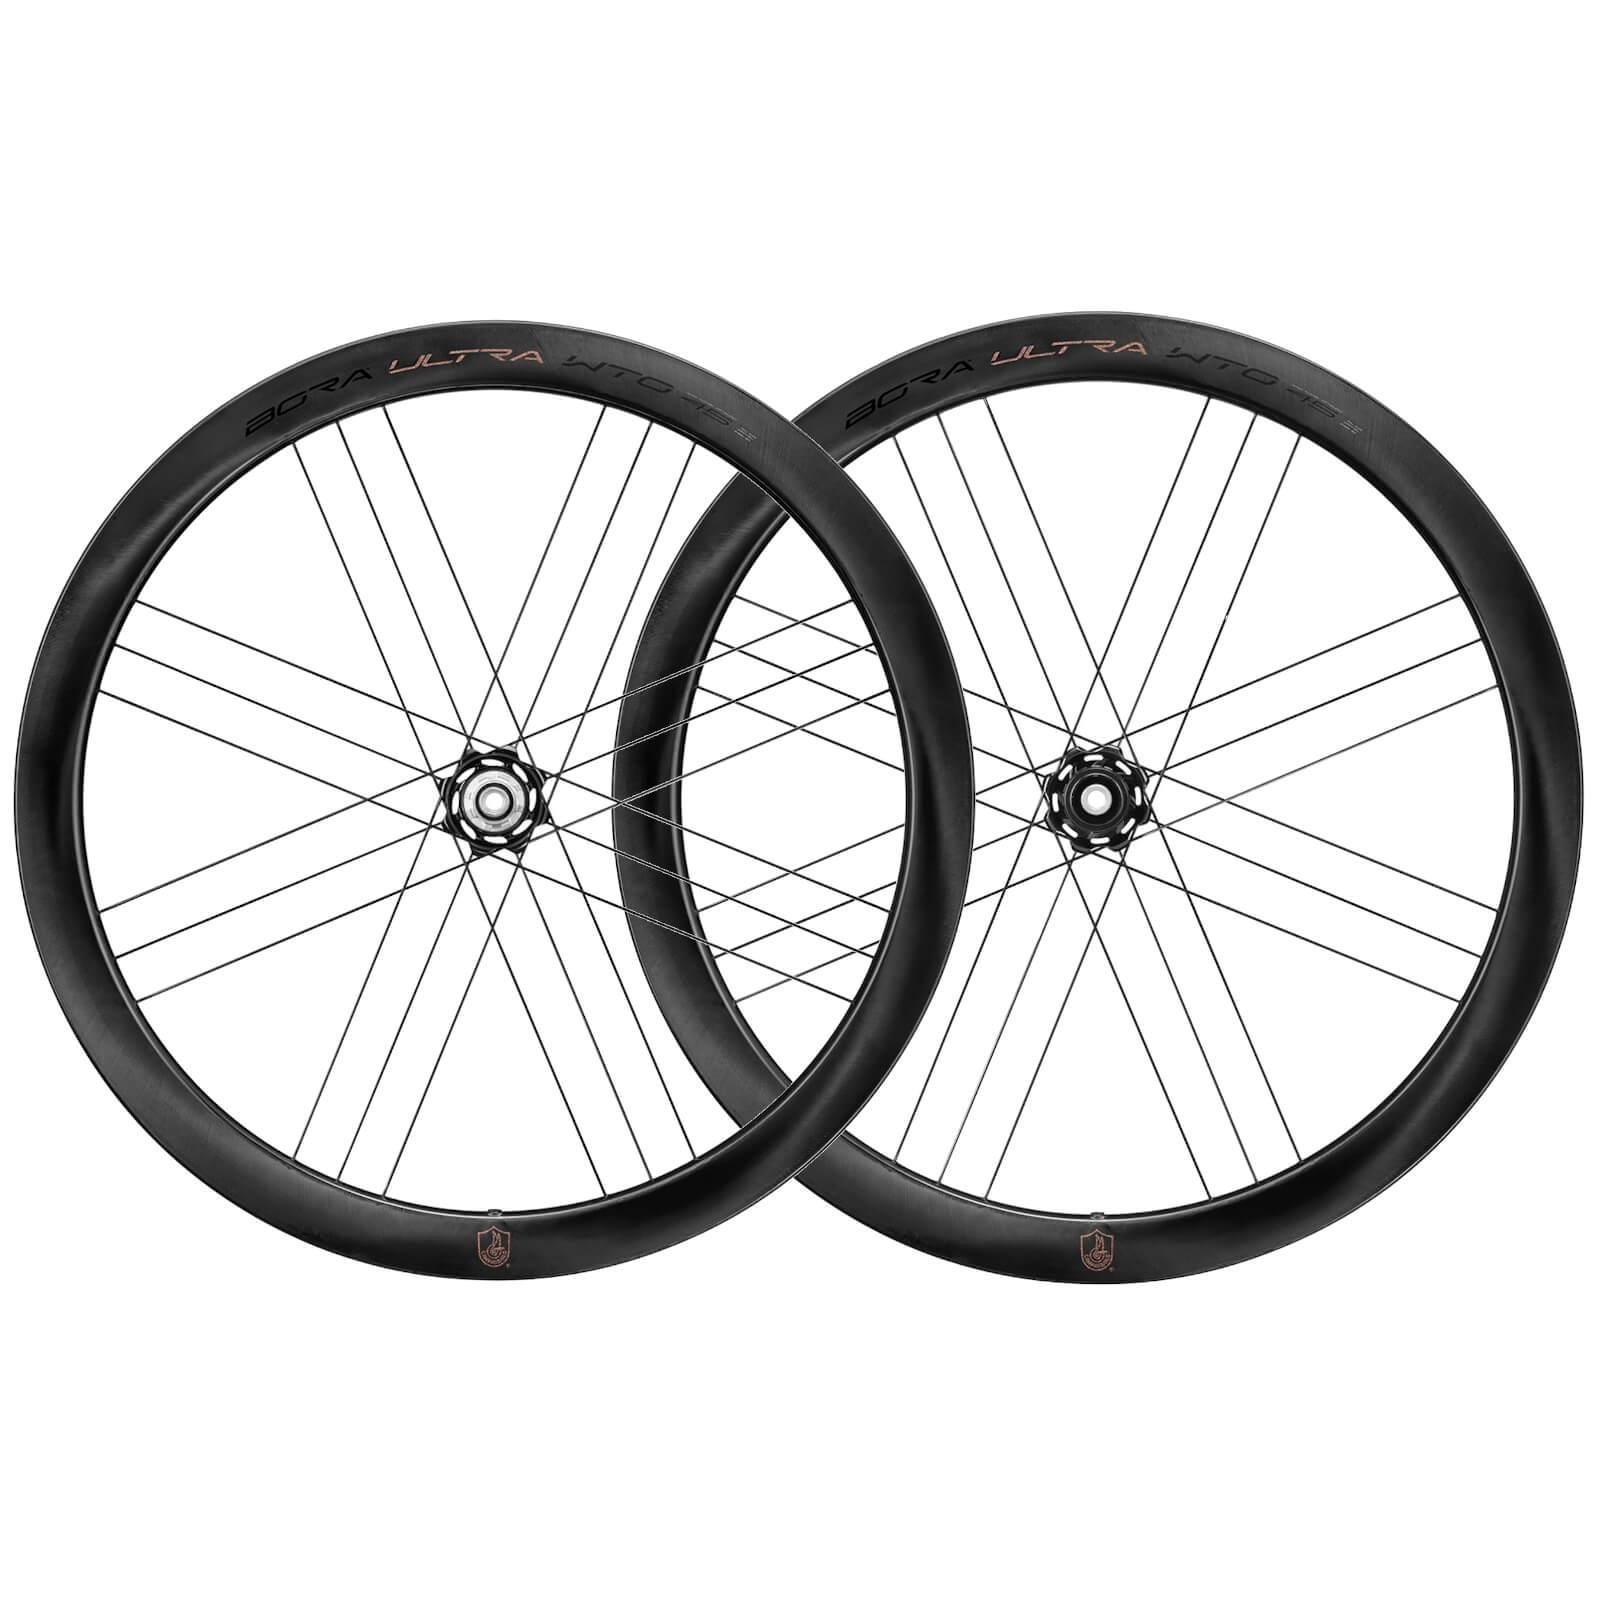 Campagnolo Bora Ultra WTO 45 Disc Brake Wheelset - Shimano